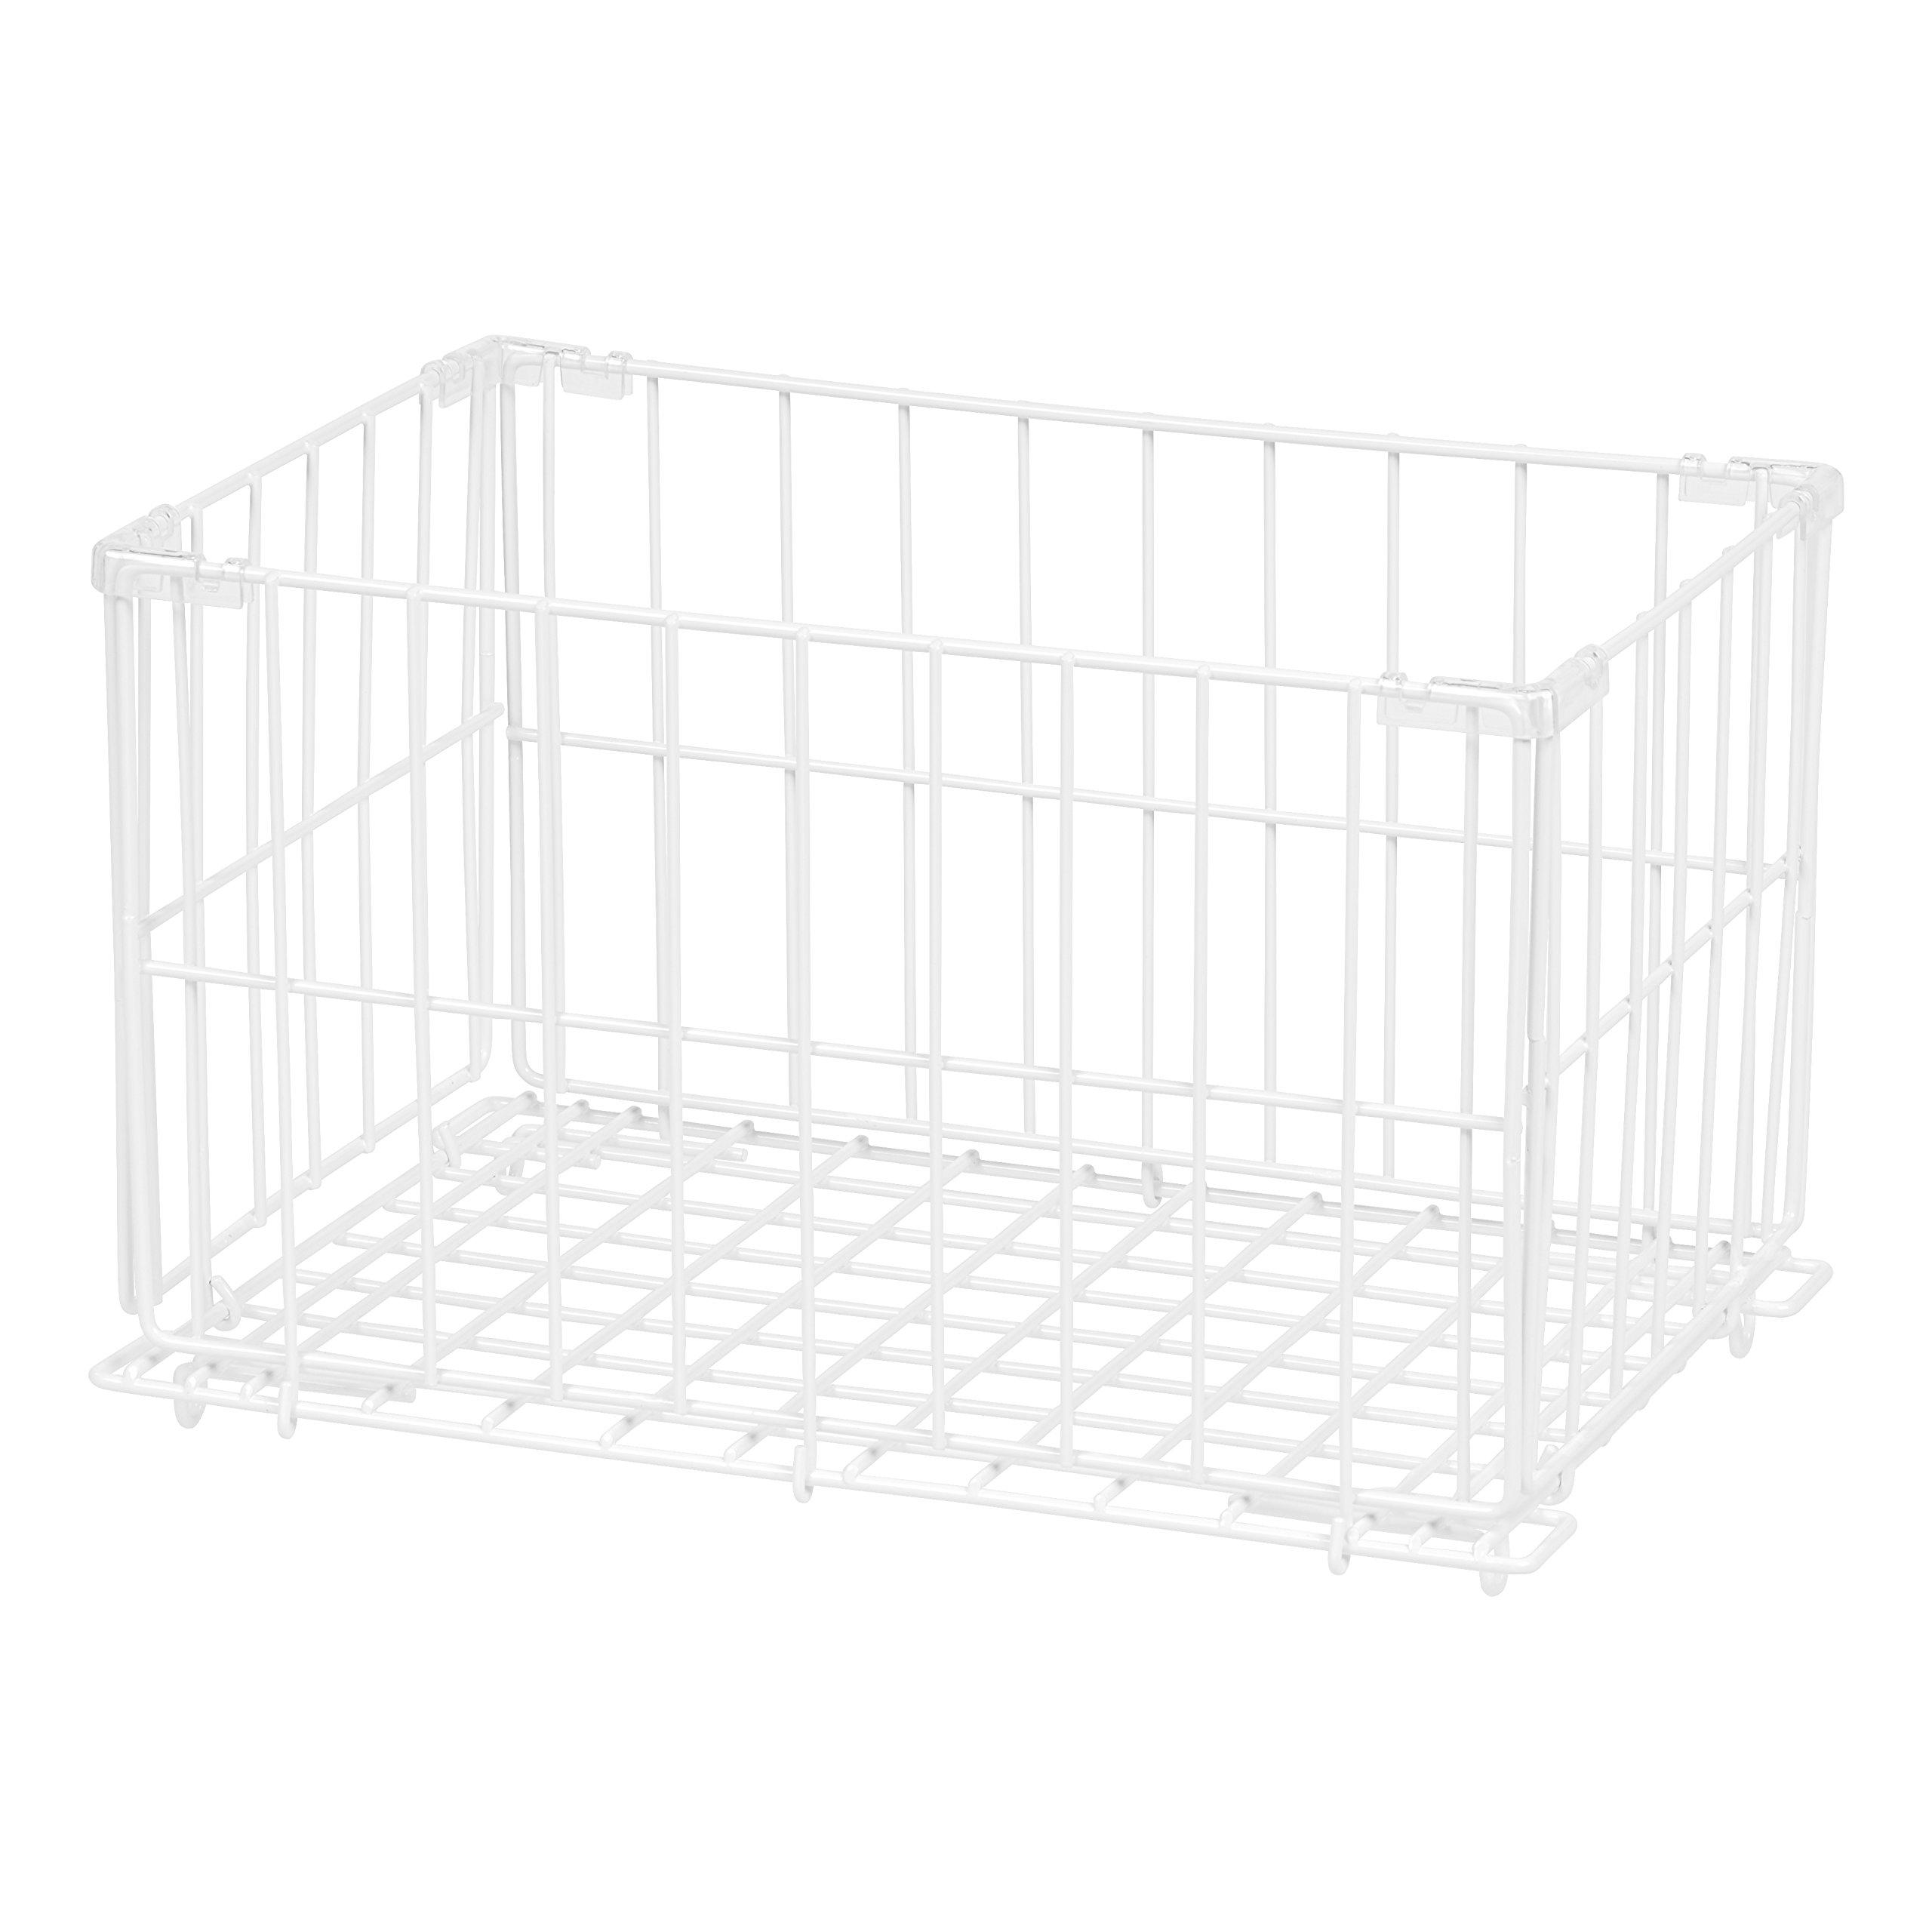 IRIS Modular Wire Stacking Storage Container, Small, White by IRIS USA,